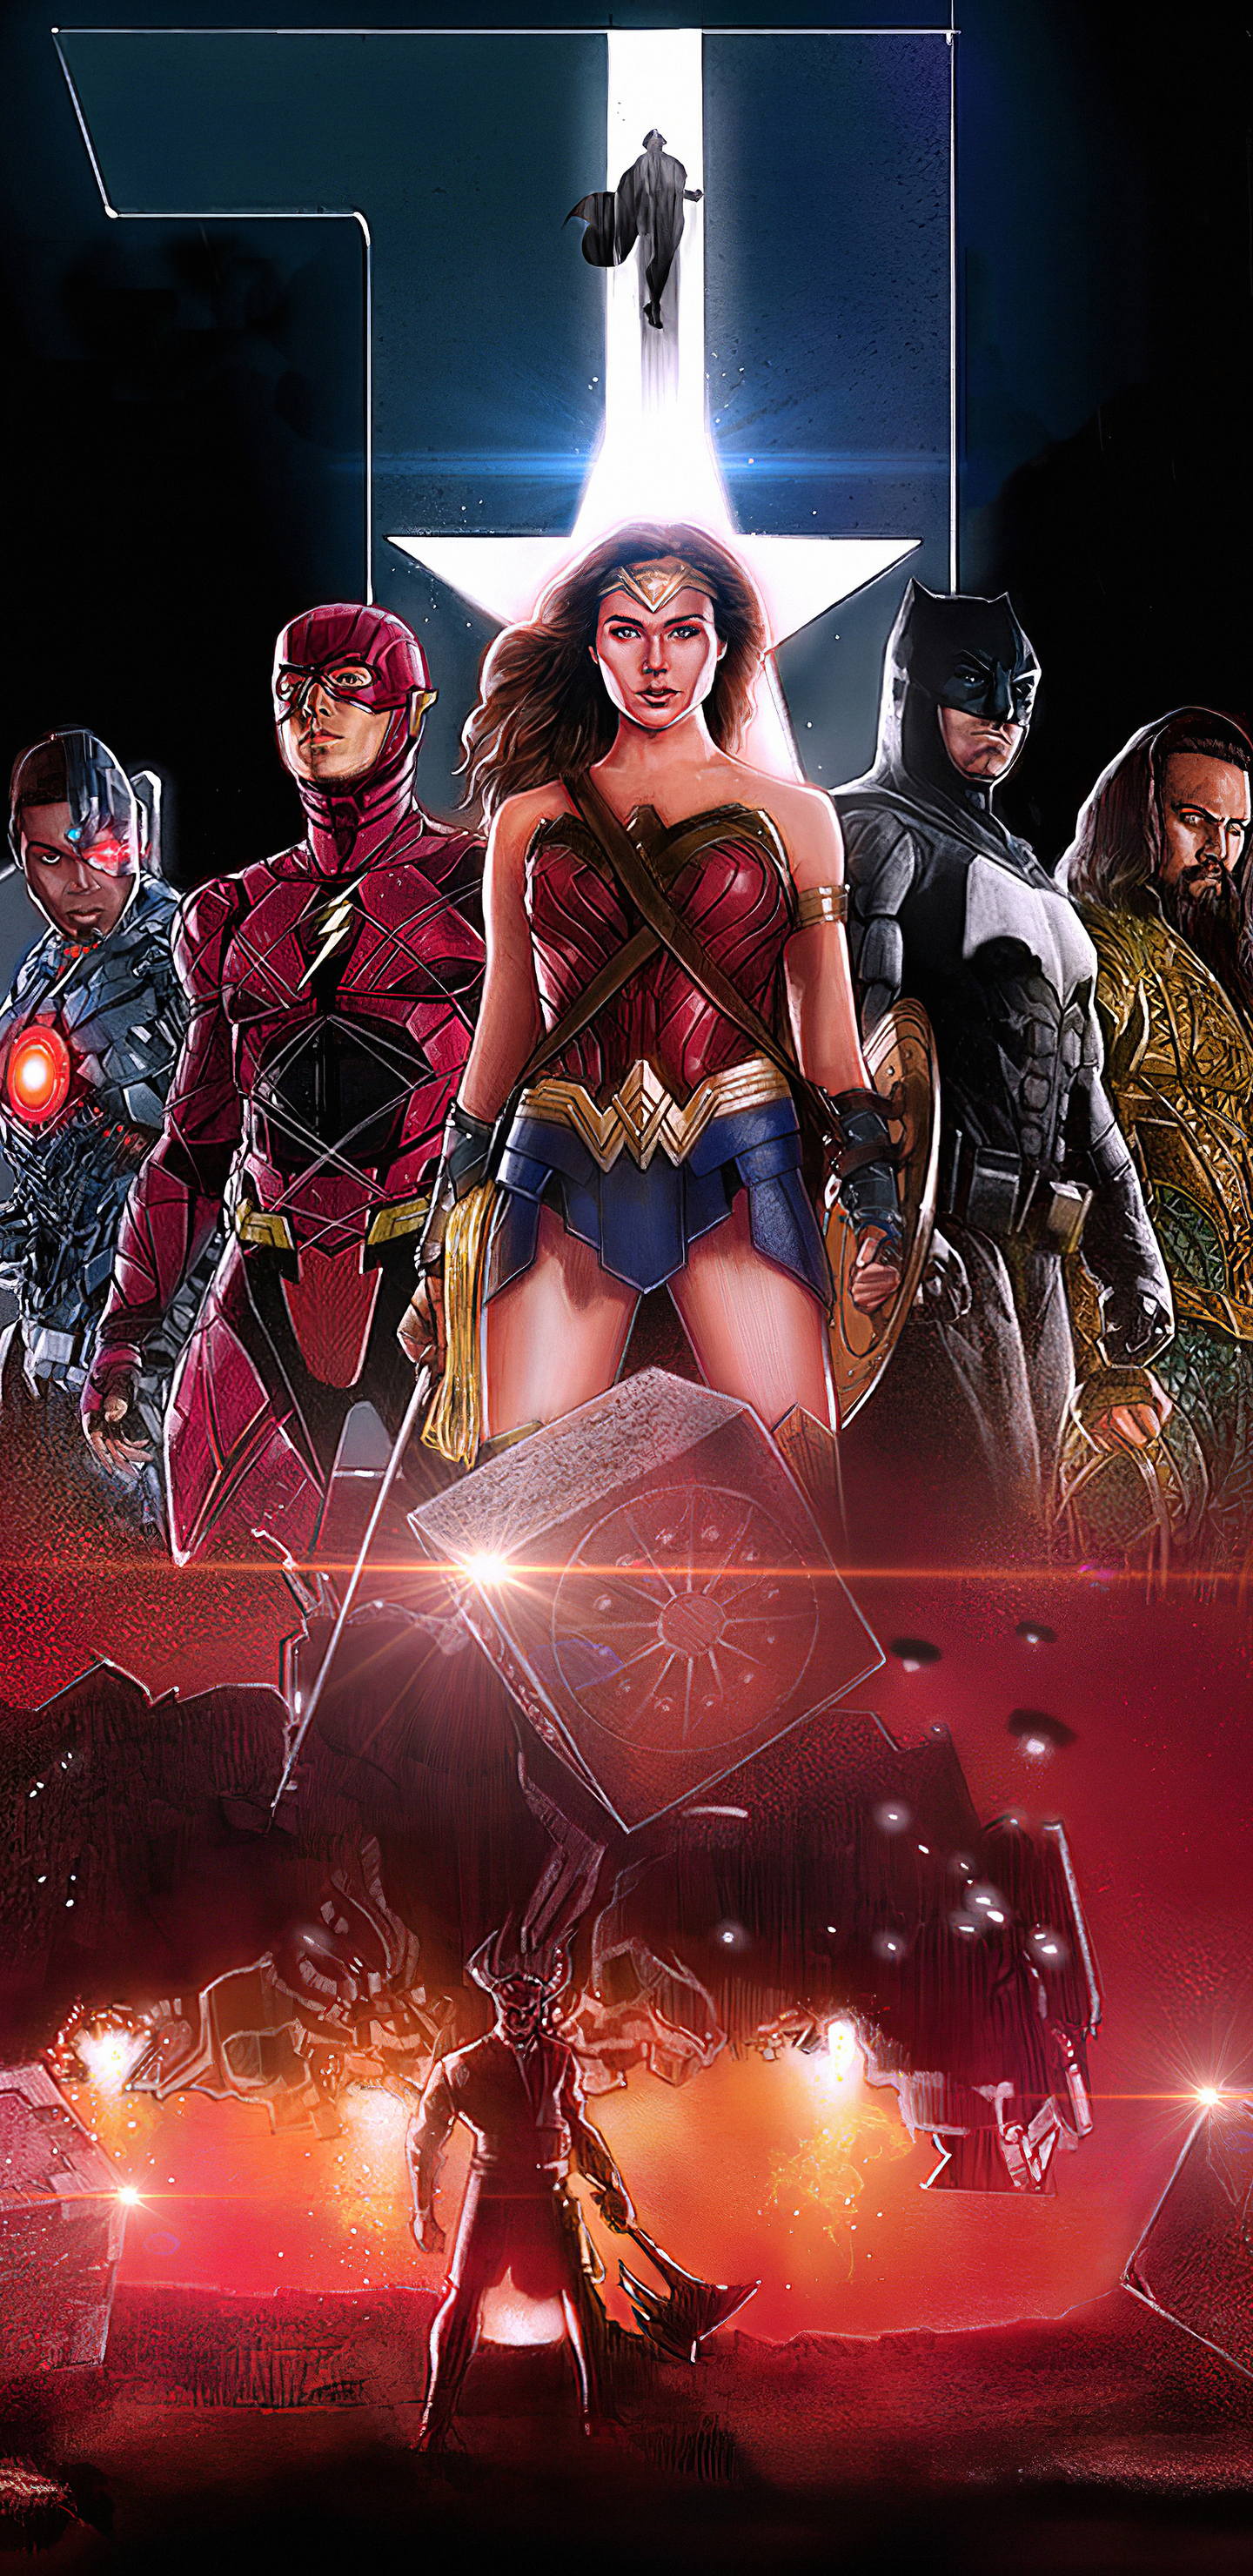 justice-league-team-art-y5.jpg